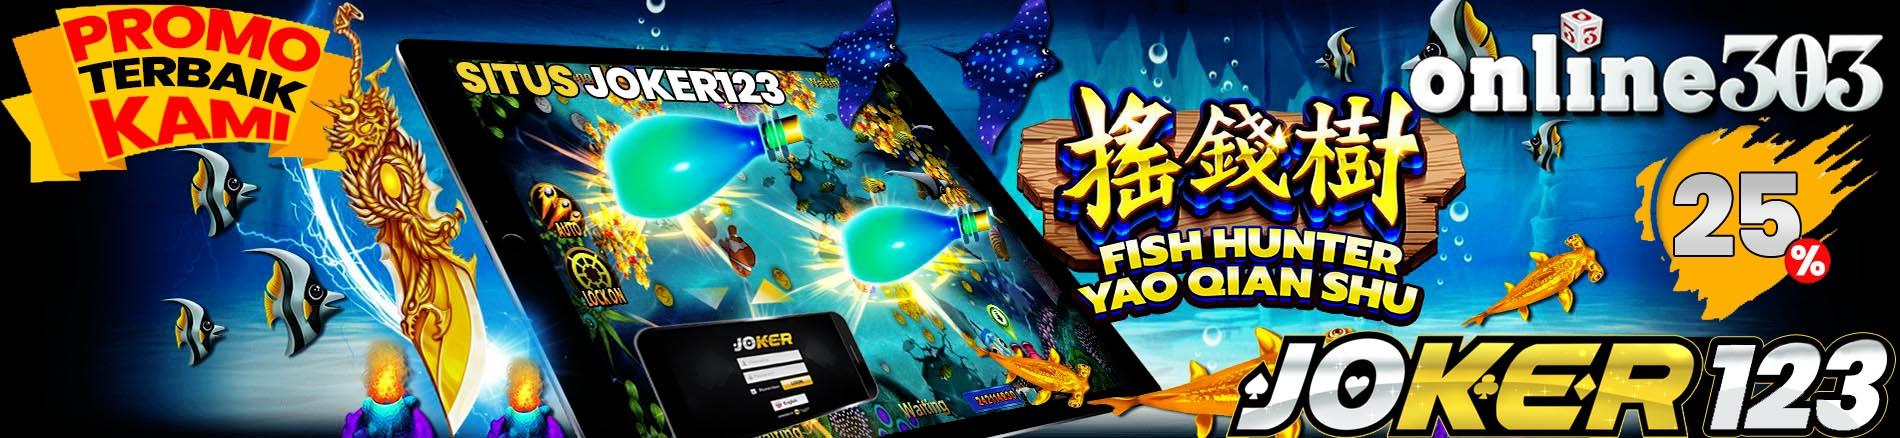 Joker123 - Online303